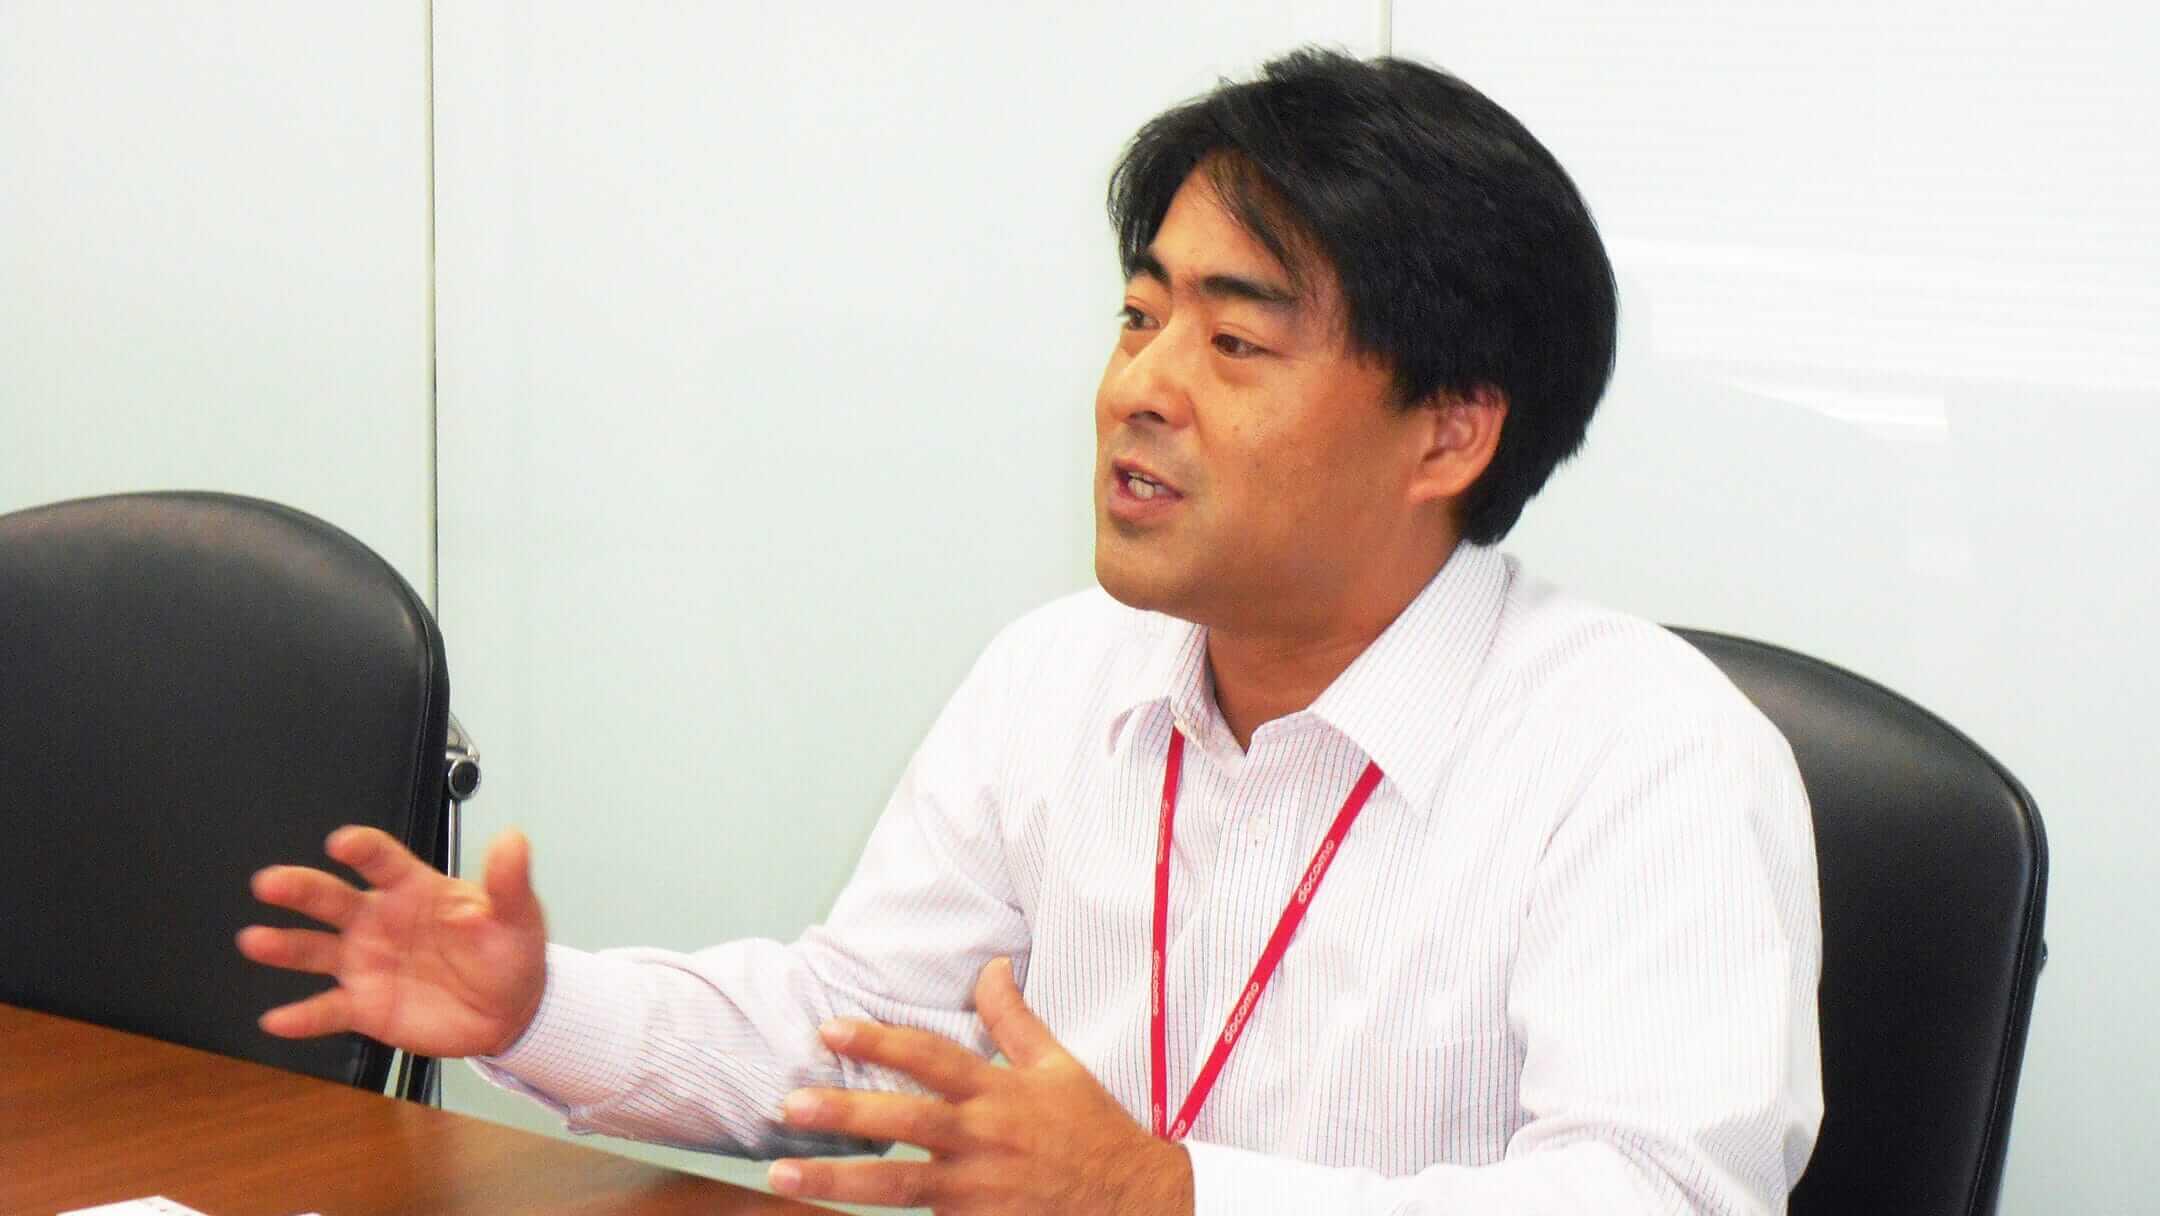 株式会社NTTドコモ 第一法人営業部 法人サービス企画第二担当 担当課長 藤田 武志 様